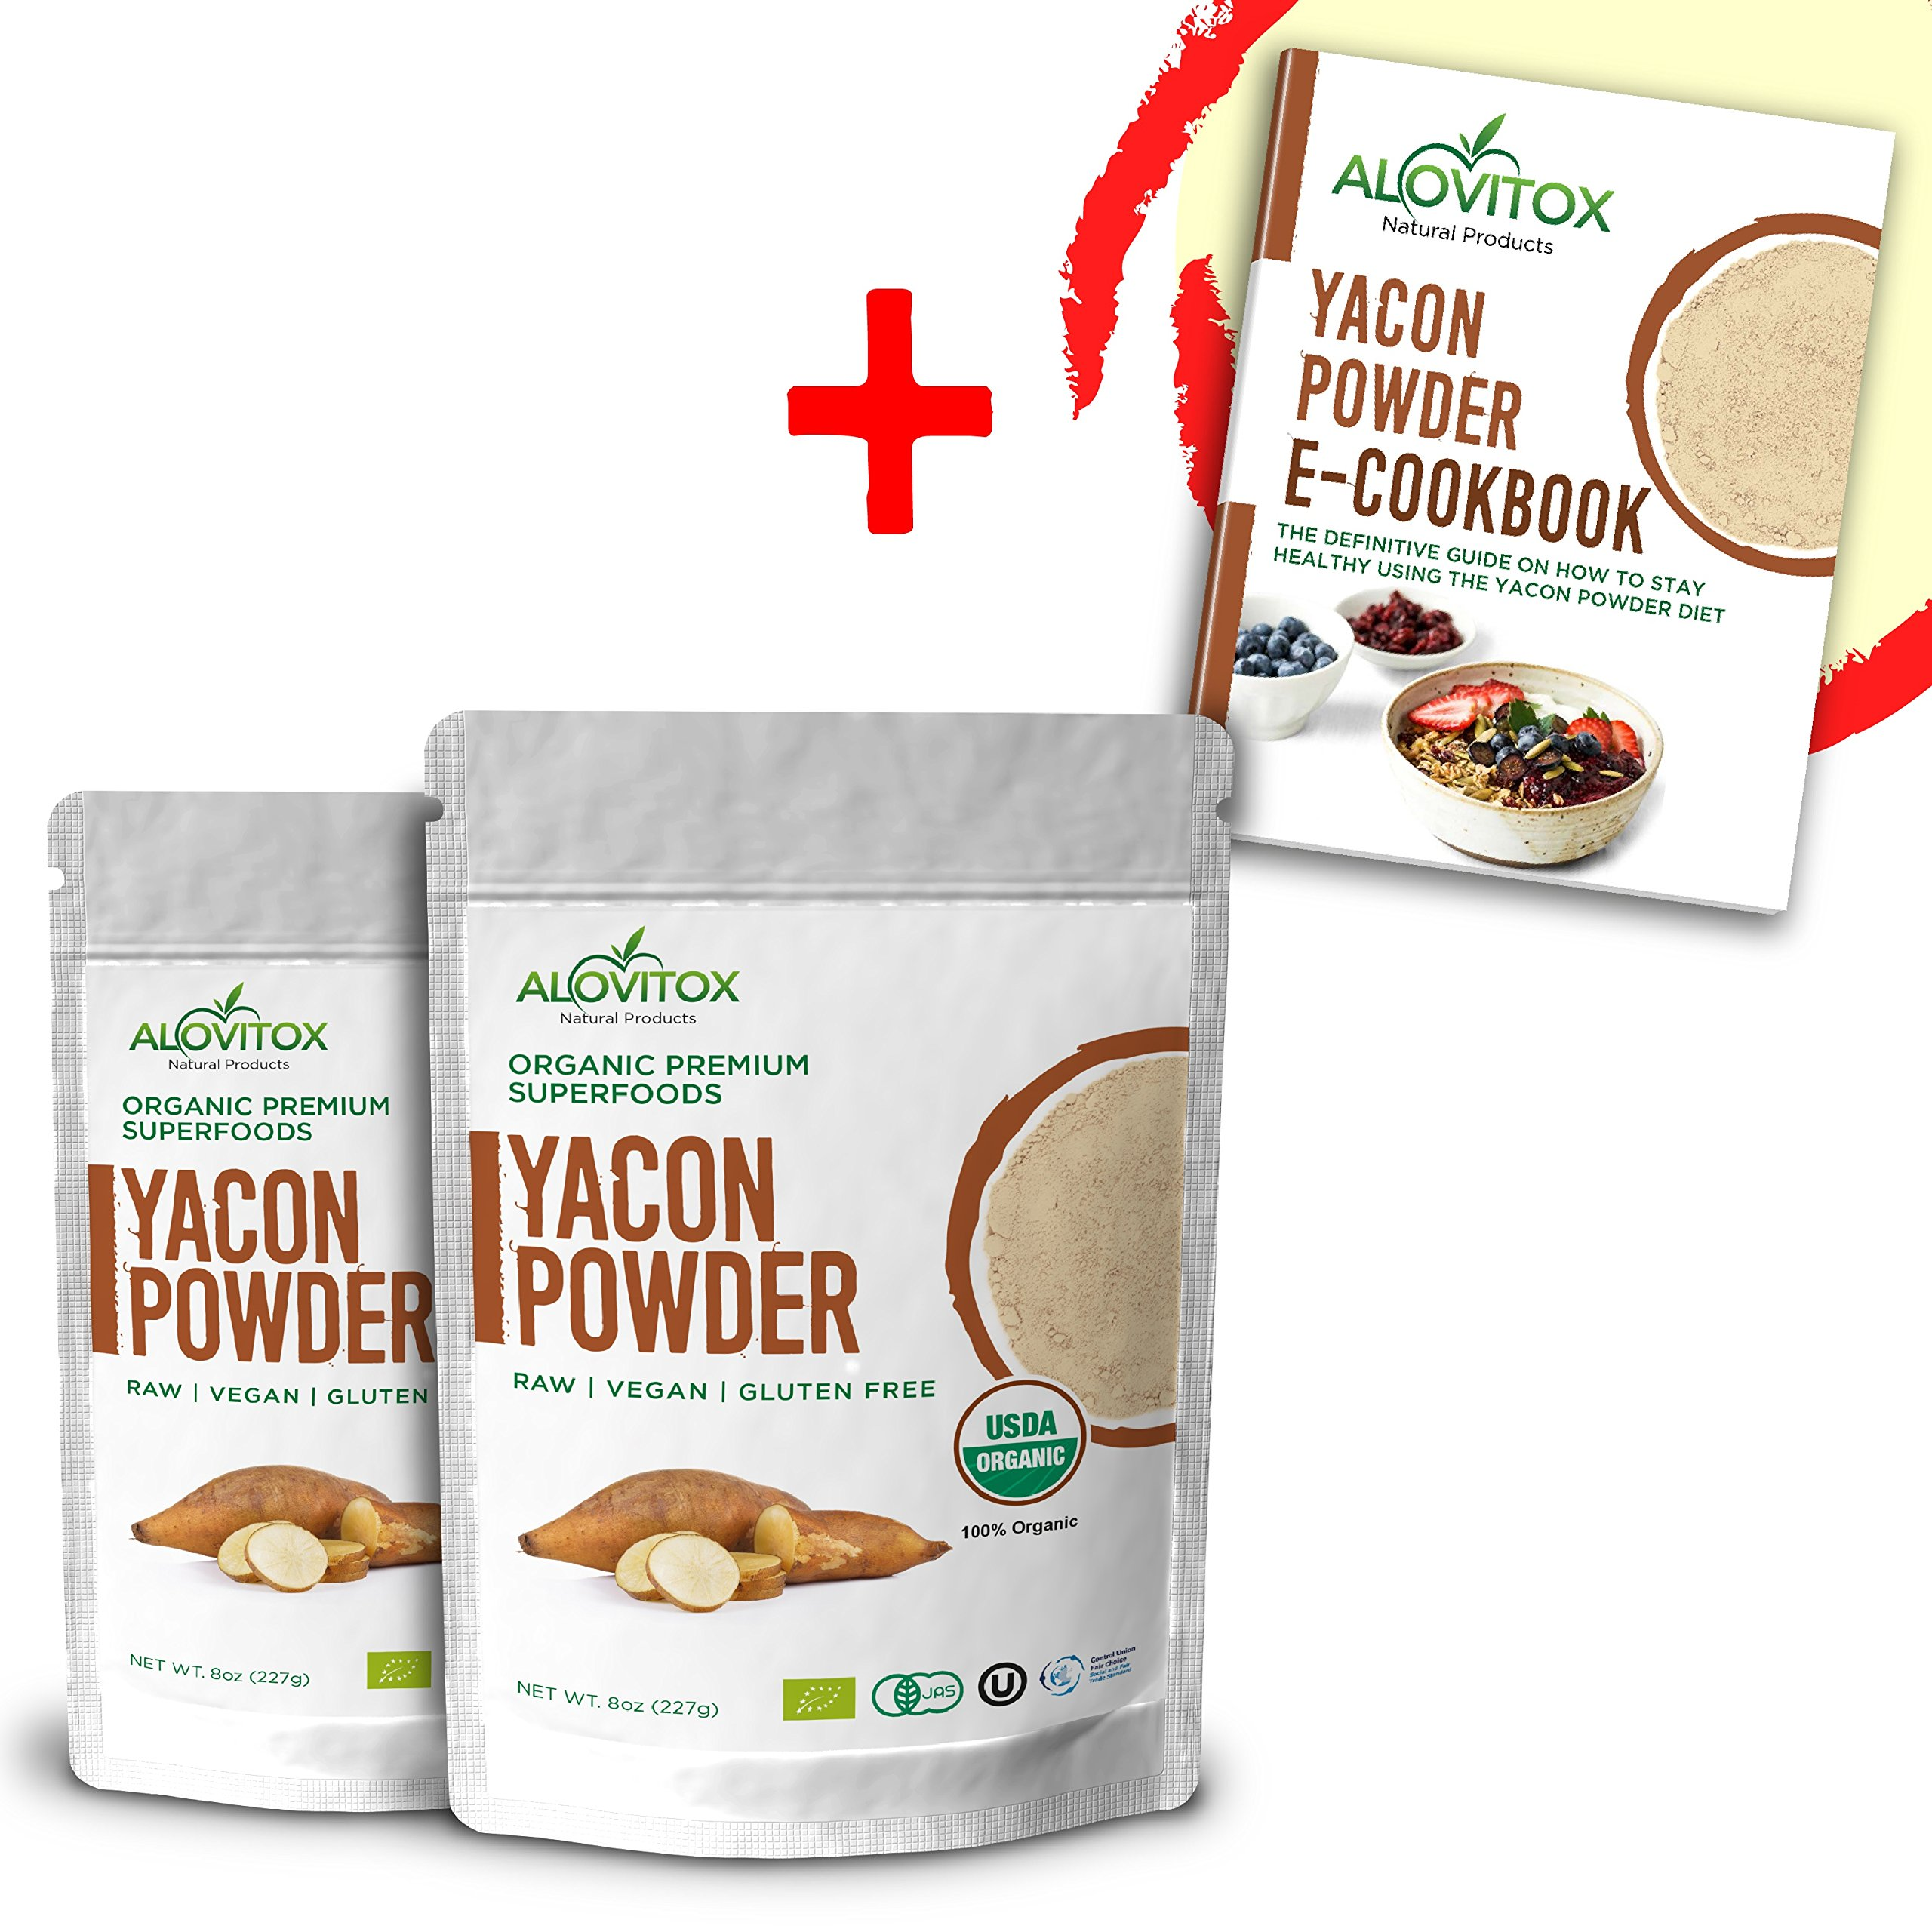 Yacon Root Powder Natural Sweetener - Sugar Substitute Sugar-Free Keto Paleo and Vegan - Wellness and Weightloss Prebiotic Diet Friendly Pure Raw Plant Extract - USDA Organic 8oz by Alovitox (2 Pack)